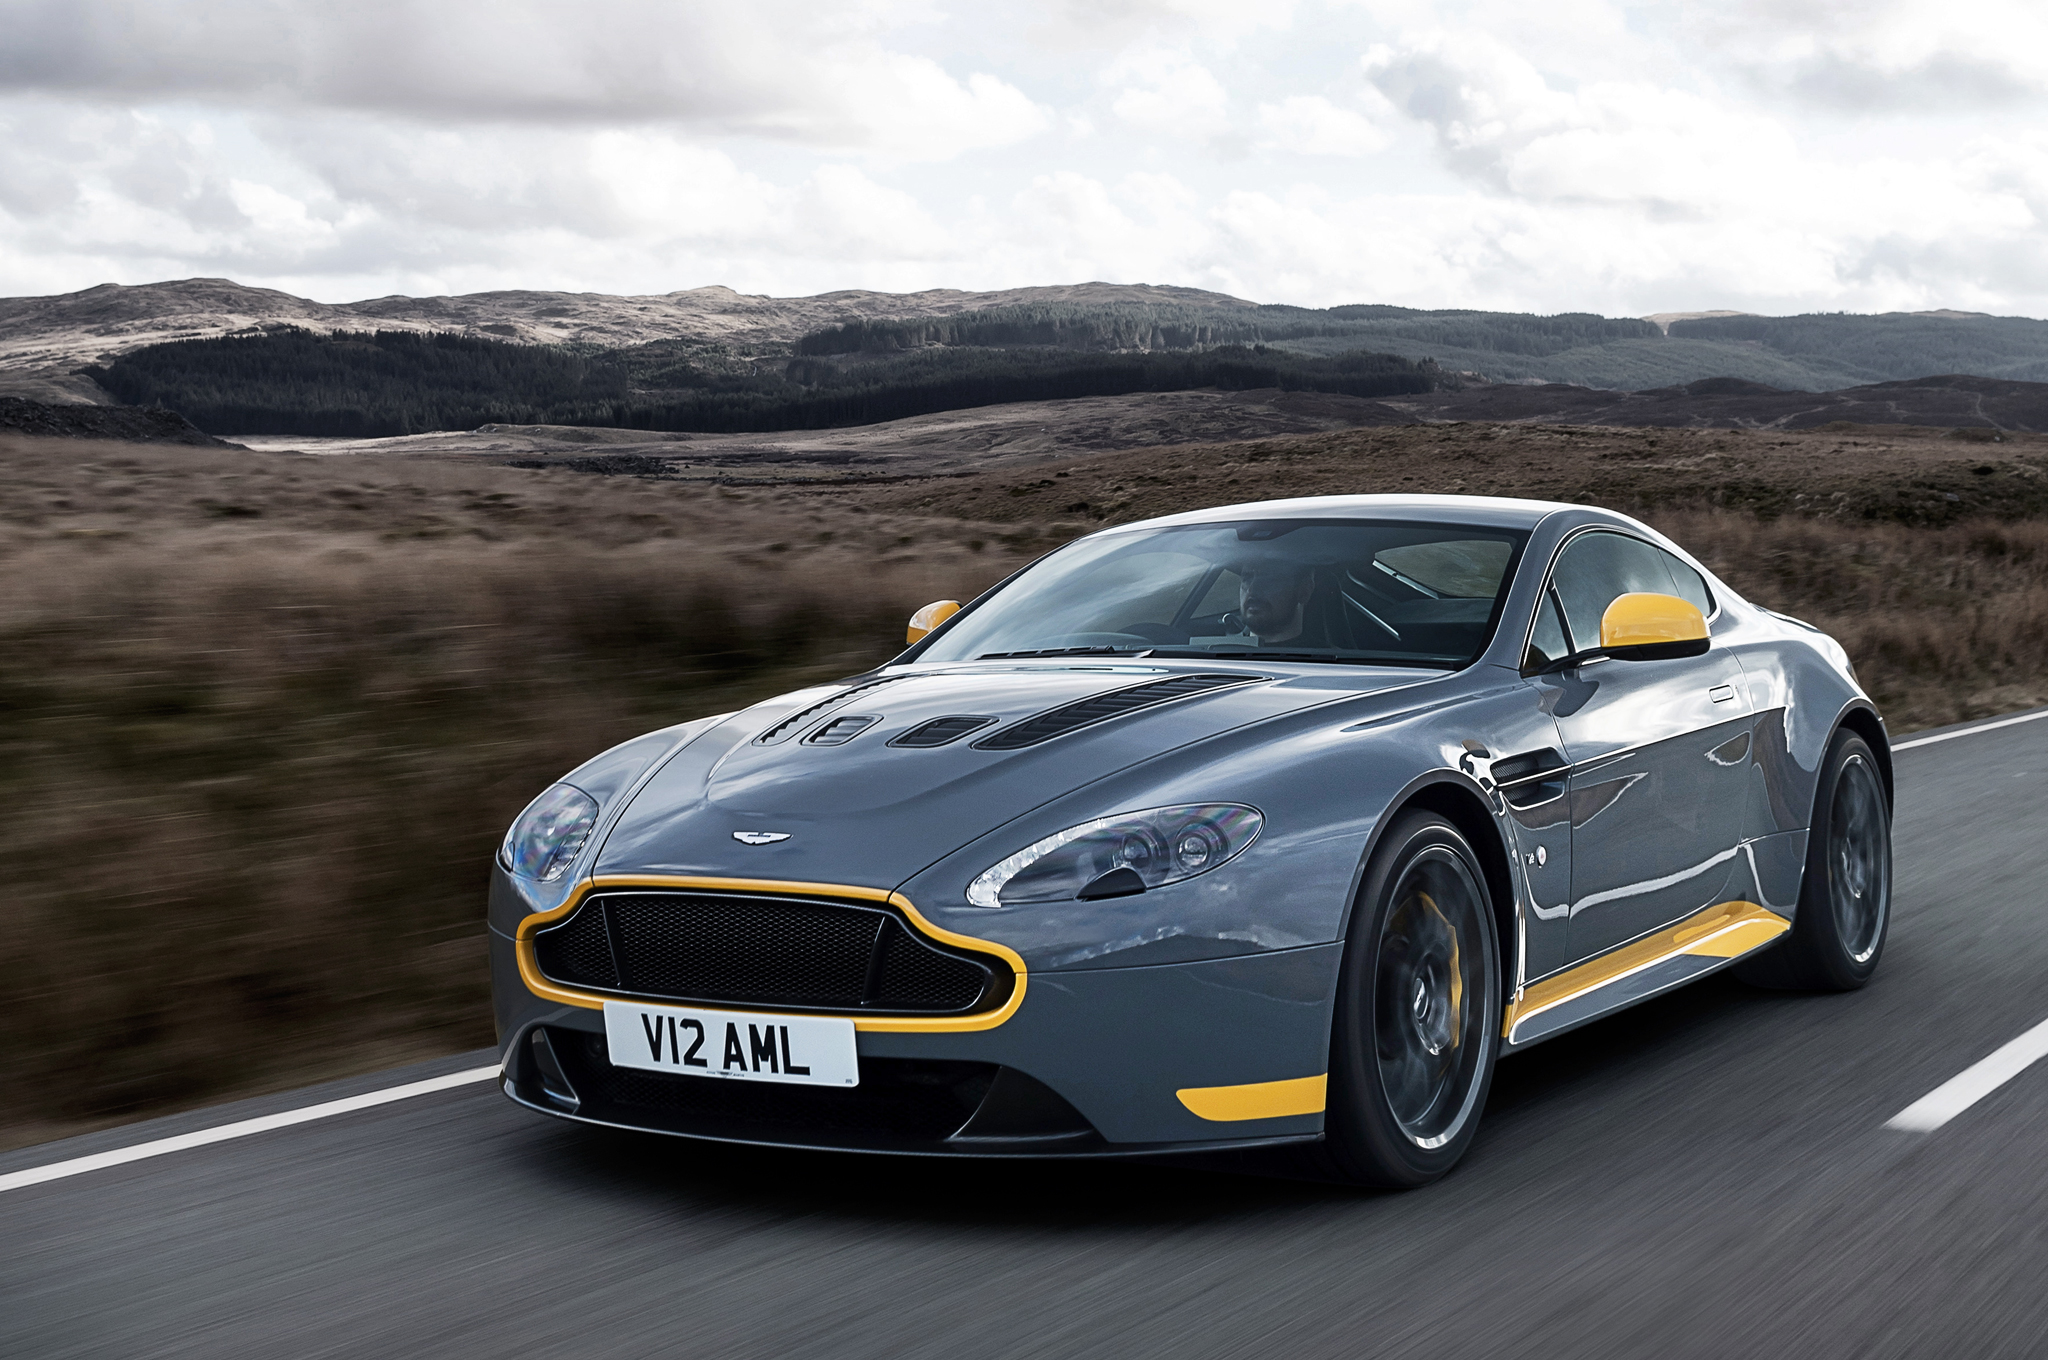 HD Quality Wallpaper   Collection: Vehicles, 2048x1360 Aston Martin Vantage S